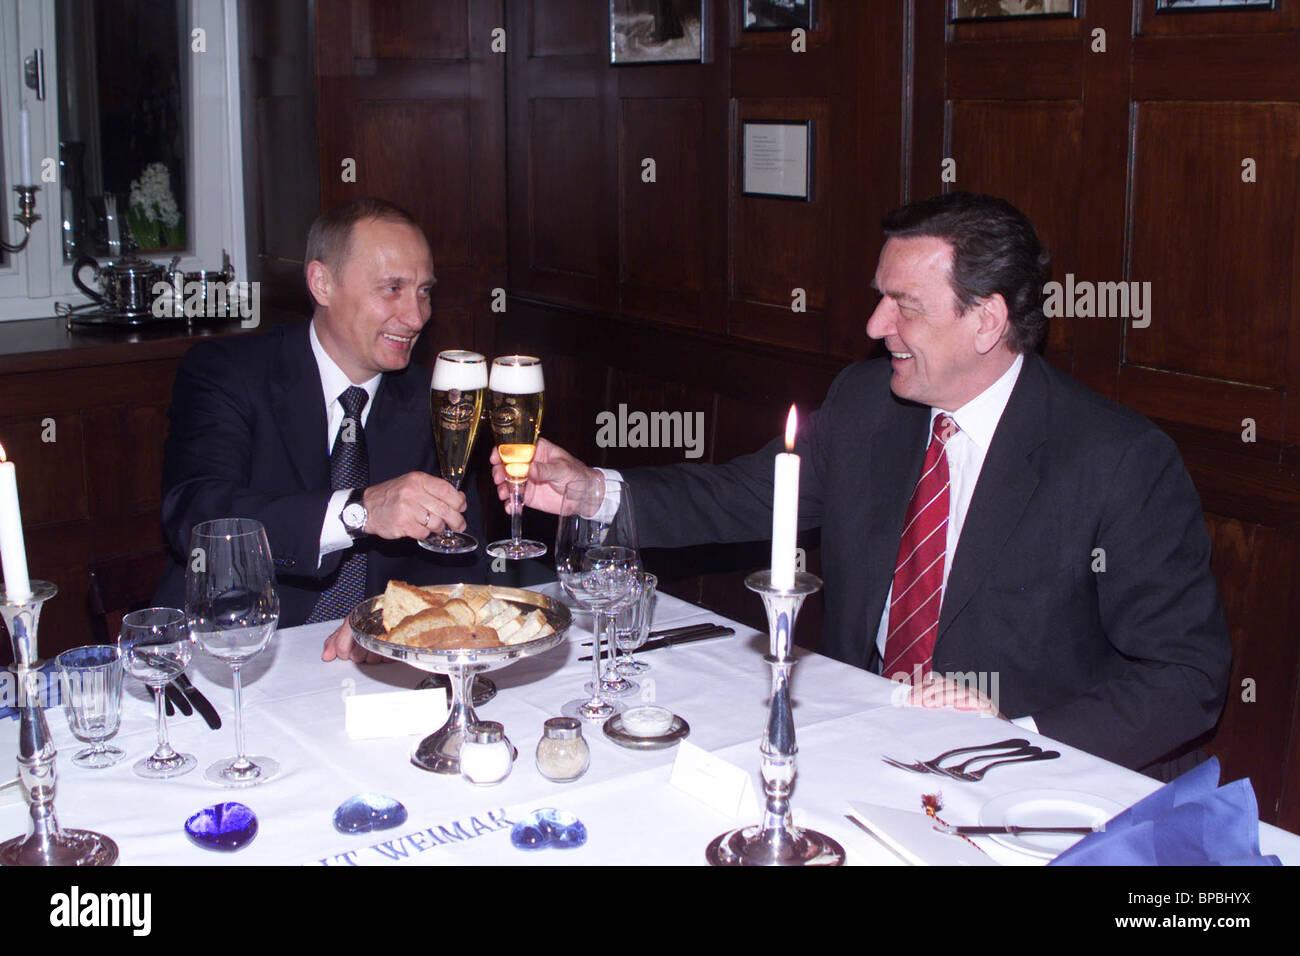 President Putin met with Chancellor Schroeder in Weimar - Stock Image